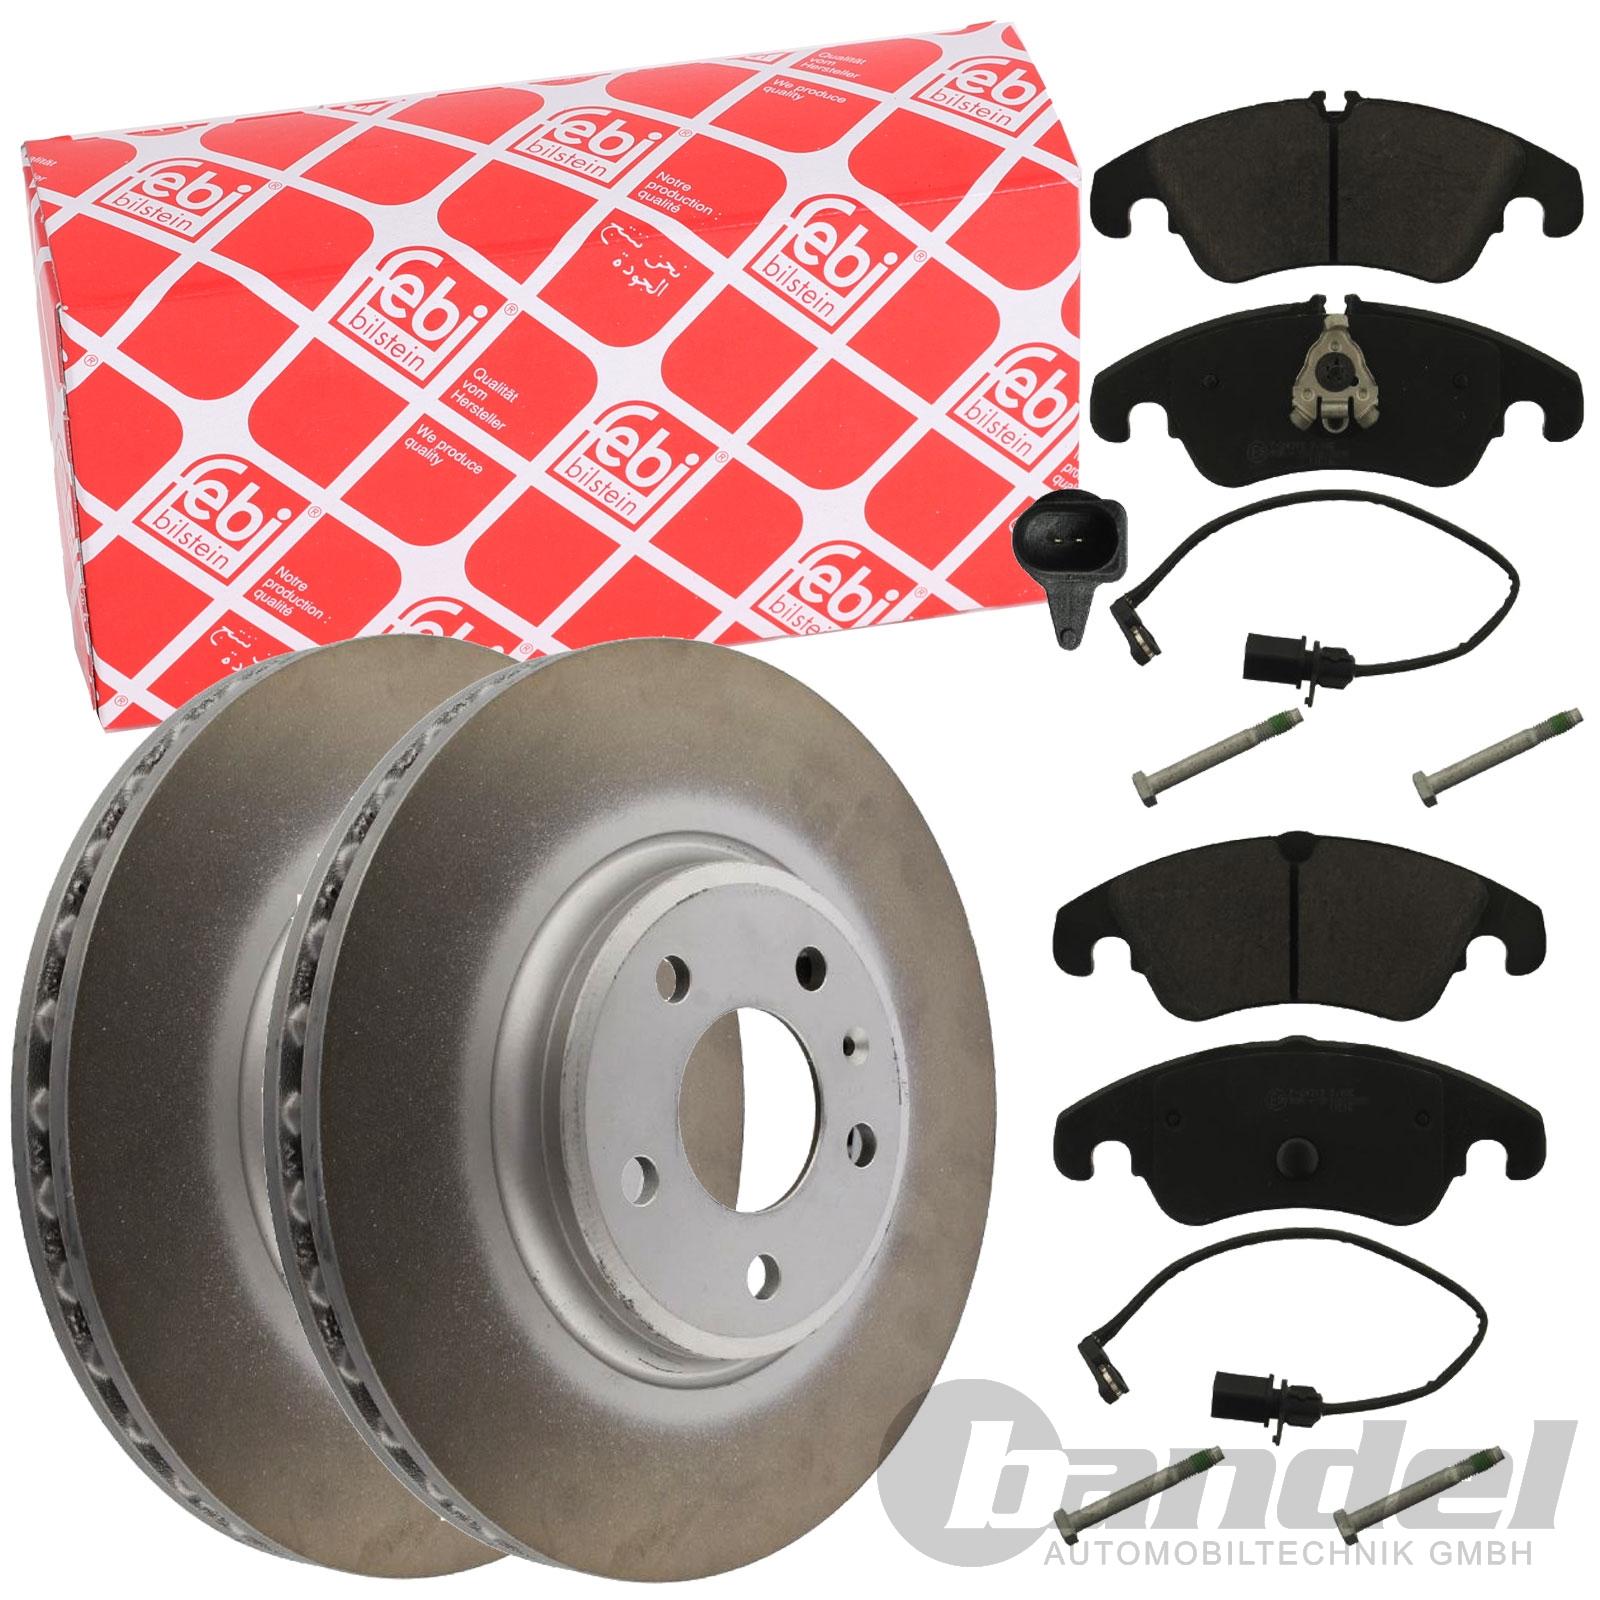 Bremsbeläge vorne Audi A4 A5 Q5 2 Febi Bremsscheiben